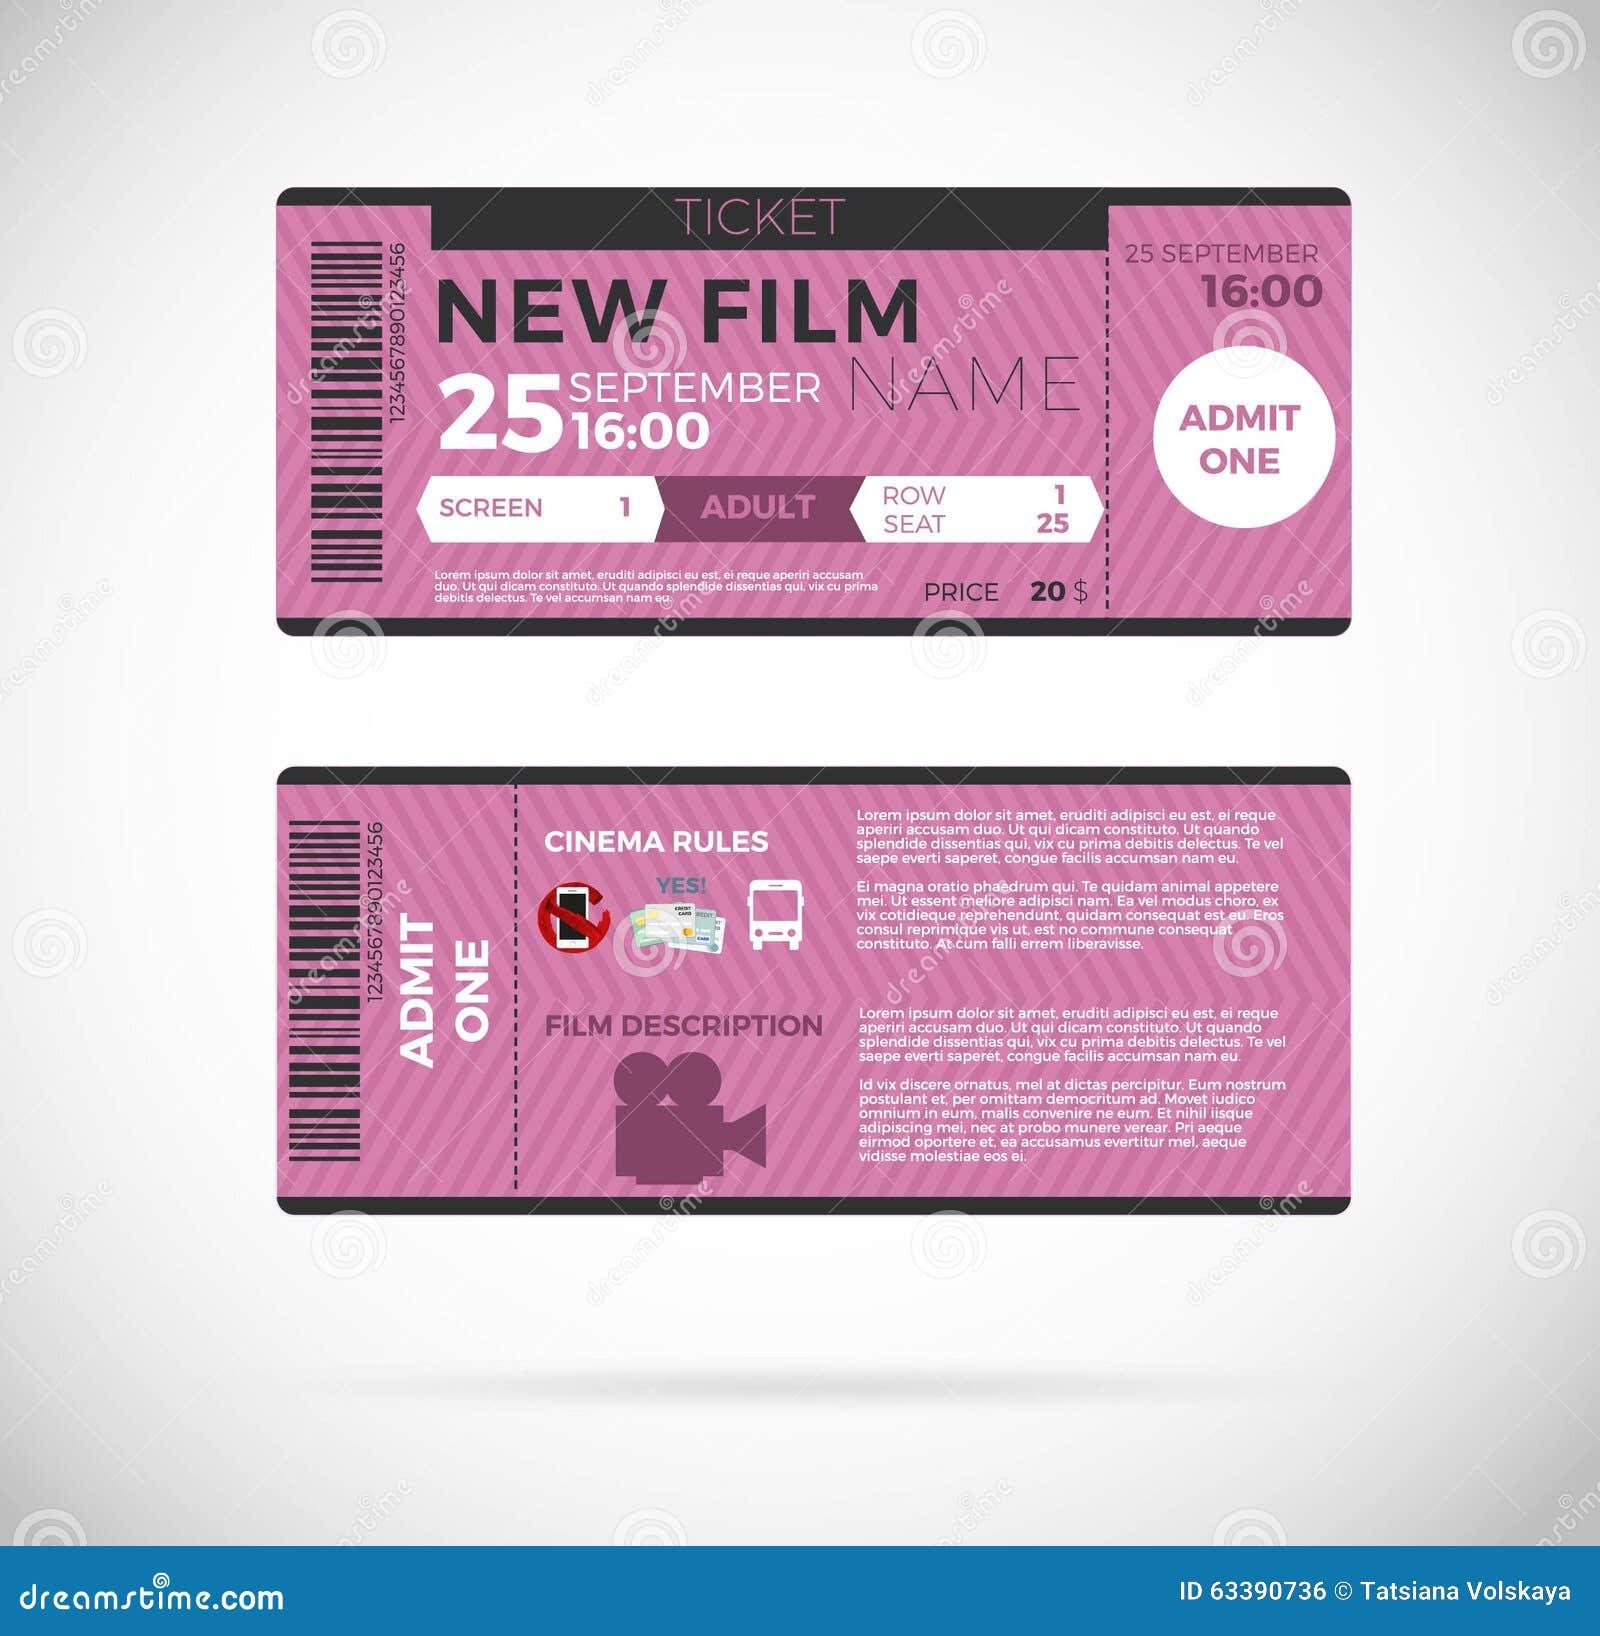 cinemamodernticketdesign vectorillustrationepsgraphicconcepticons63390736jpg – Sample Ticket Design